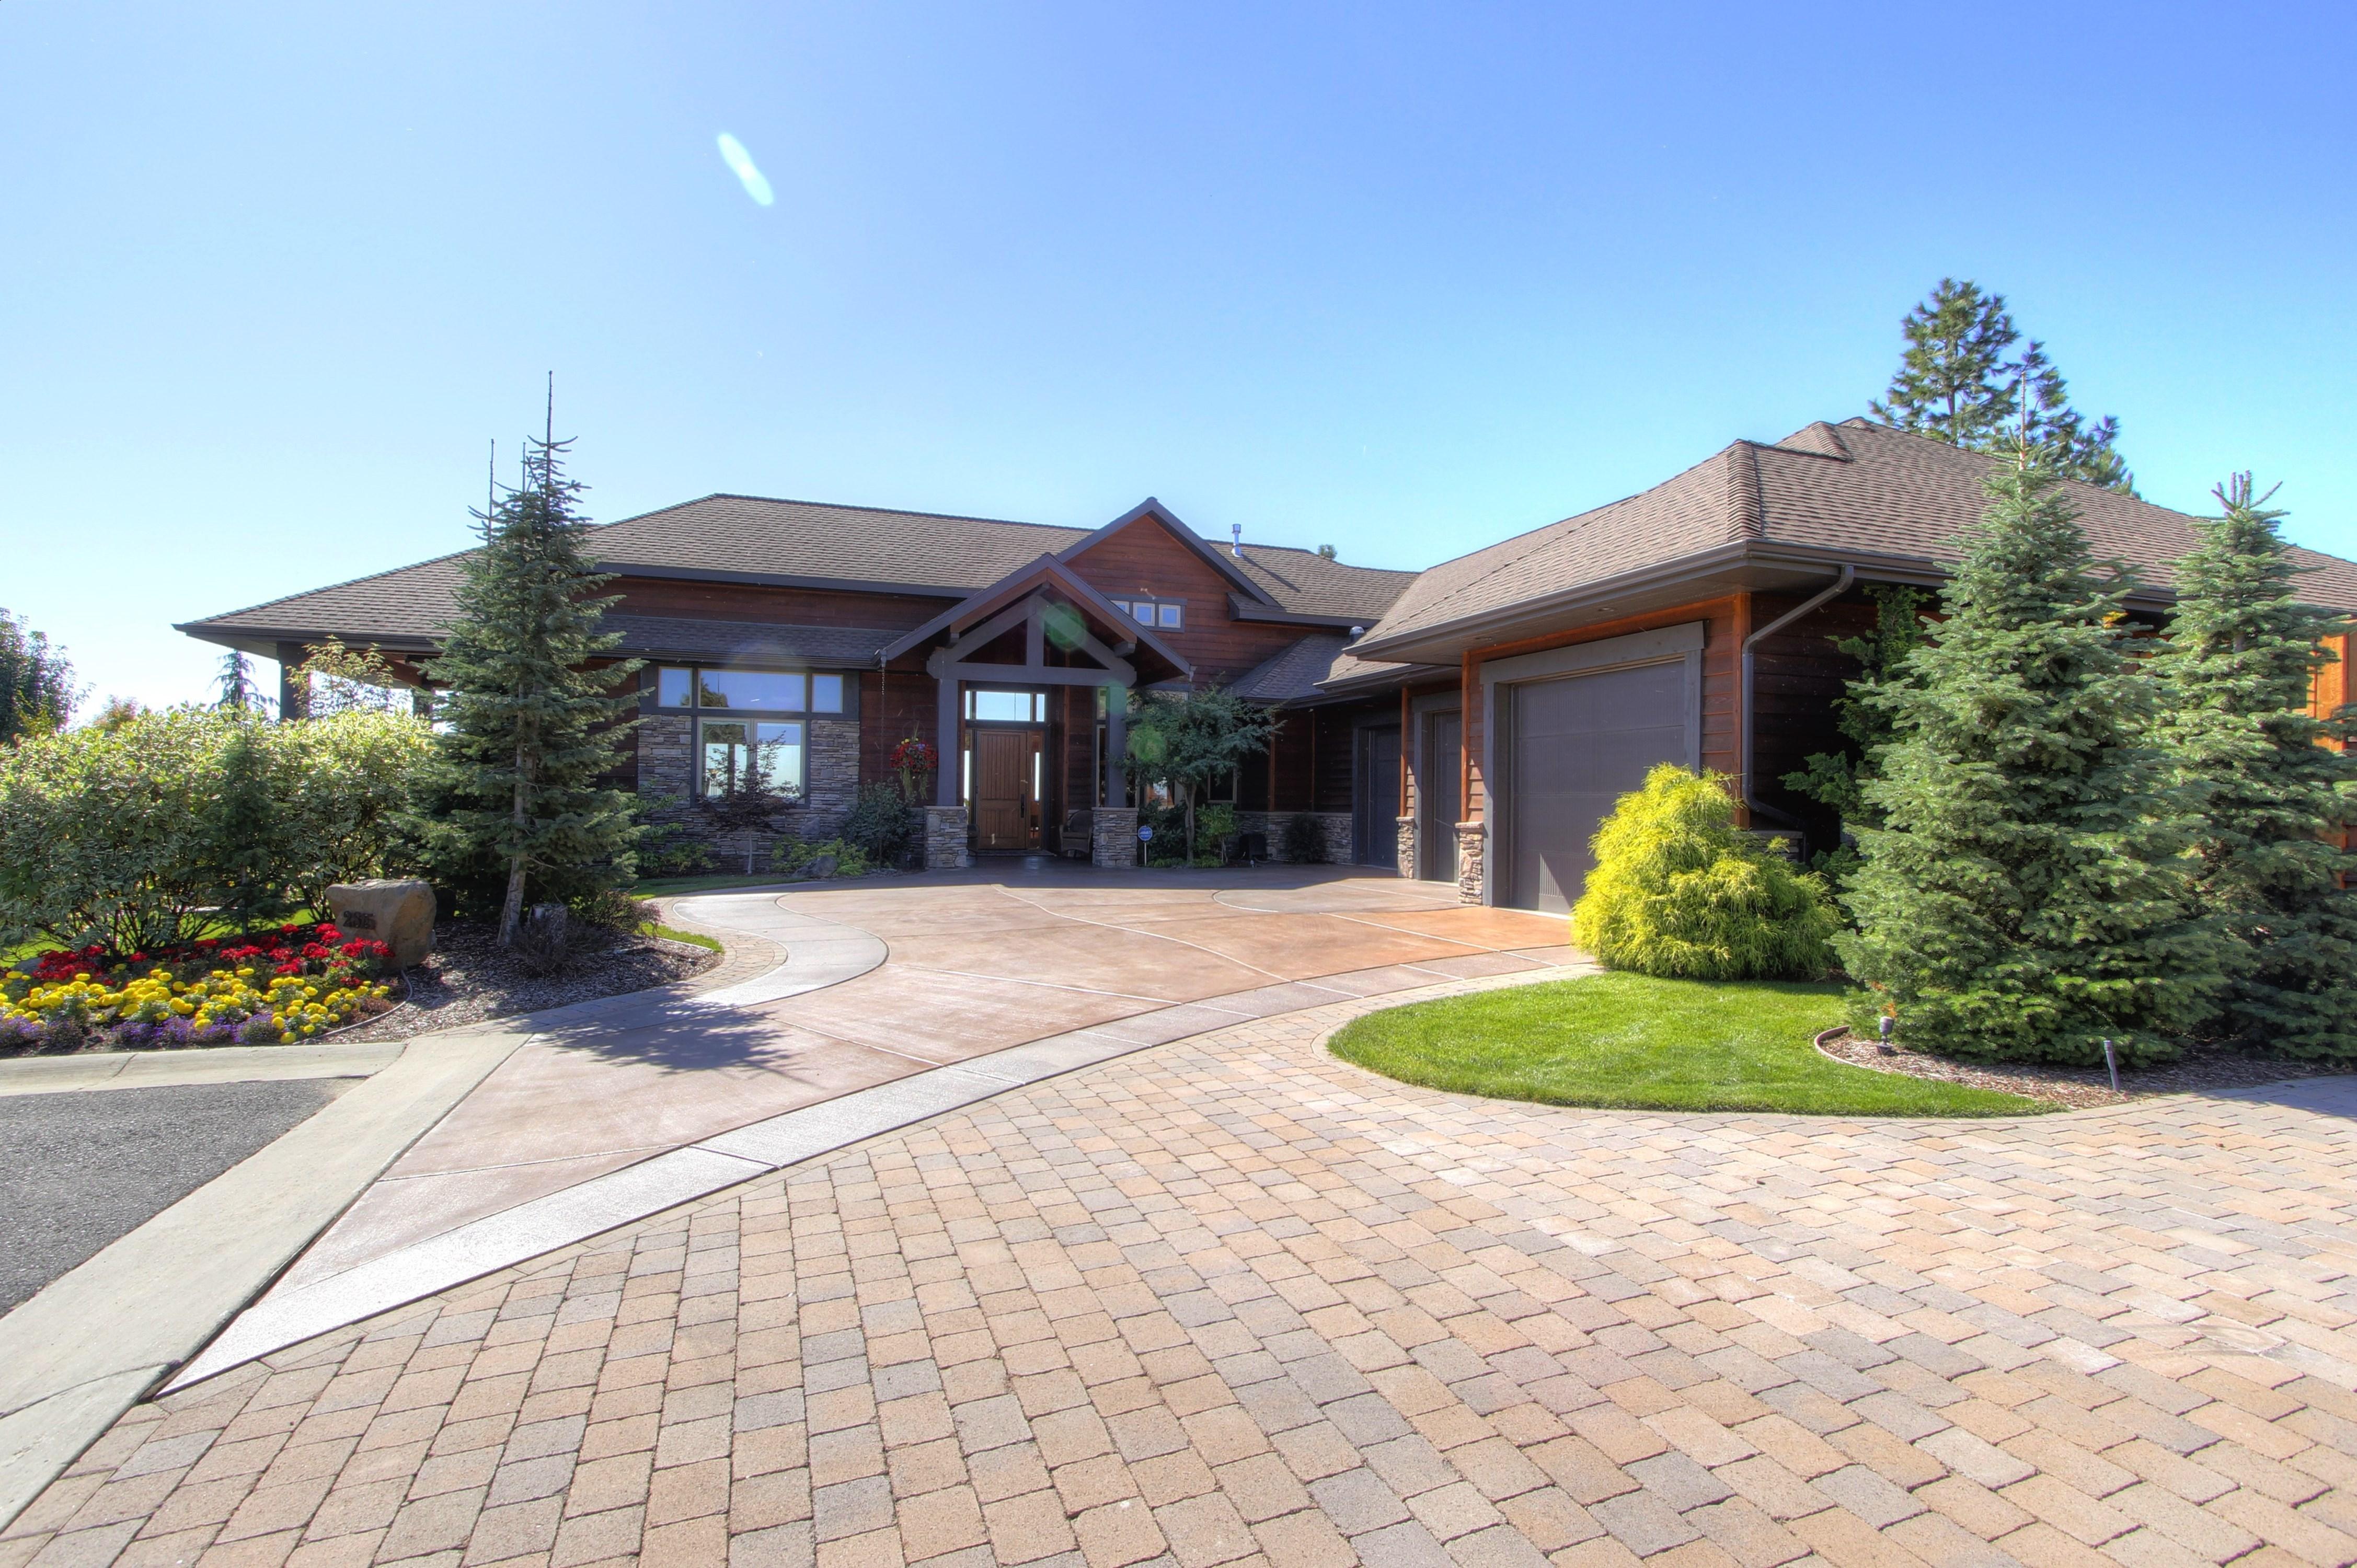 2815 W Horizon Ridge Ct, Spokane, Washington 99208